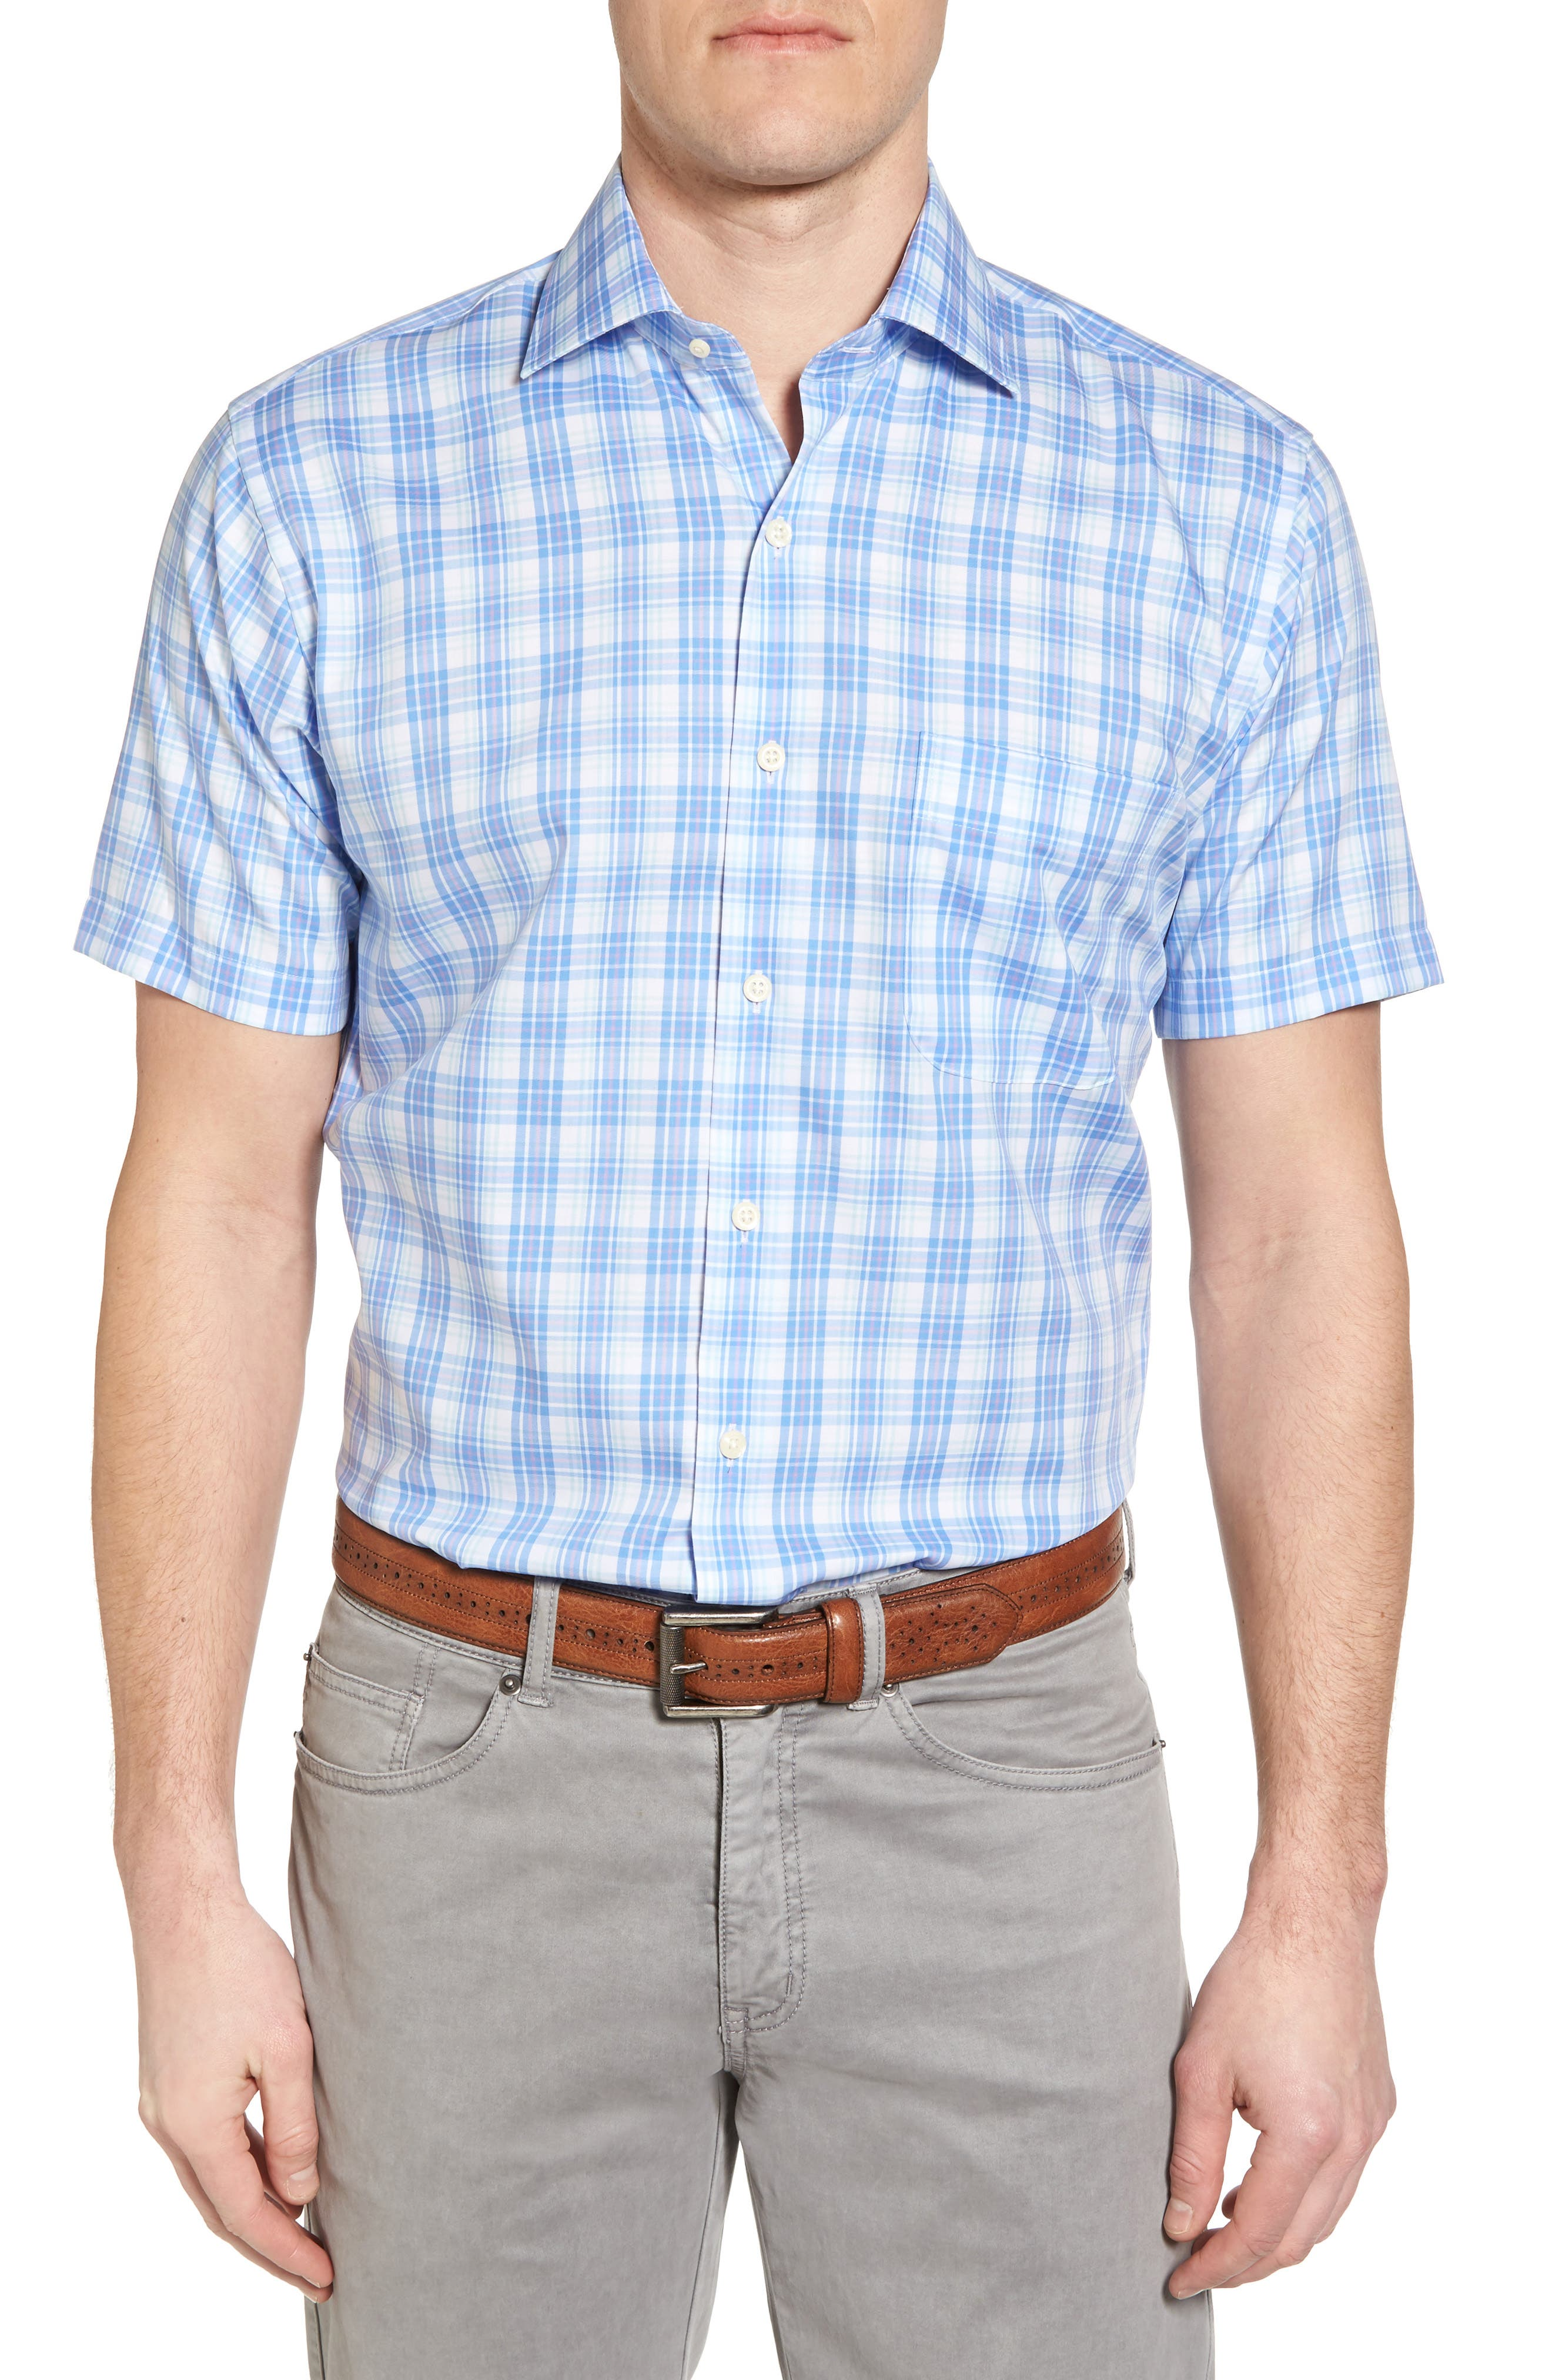 Crown Ease Sloan Regular Fit Plaid Sport Shirt,                         Main,                         color, ATLAS BLUE